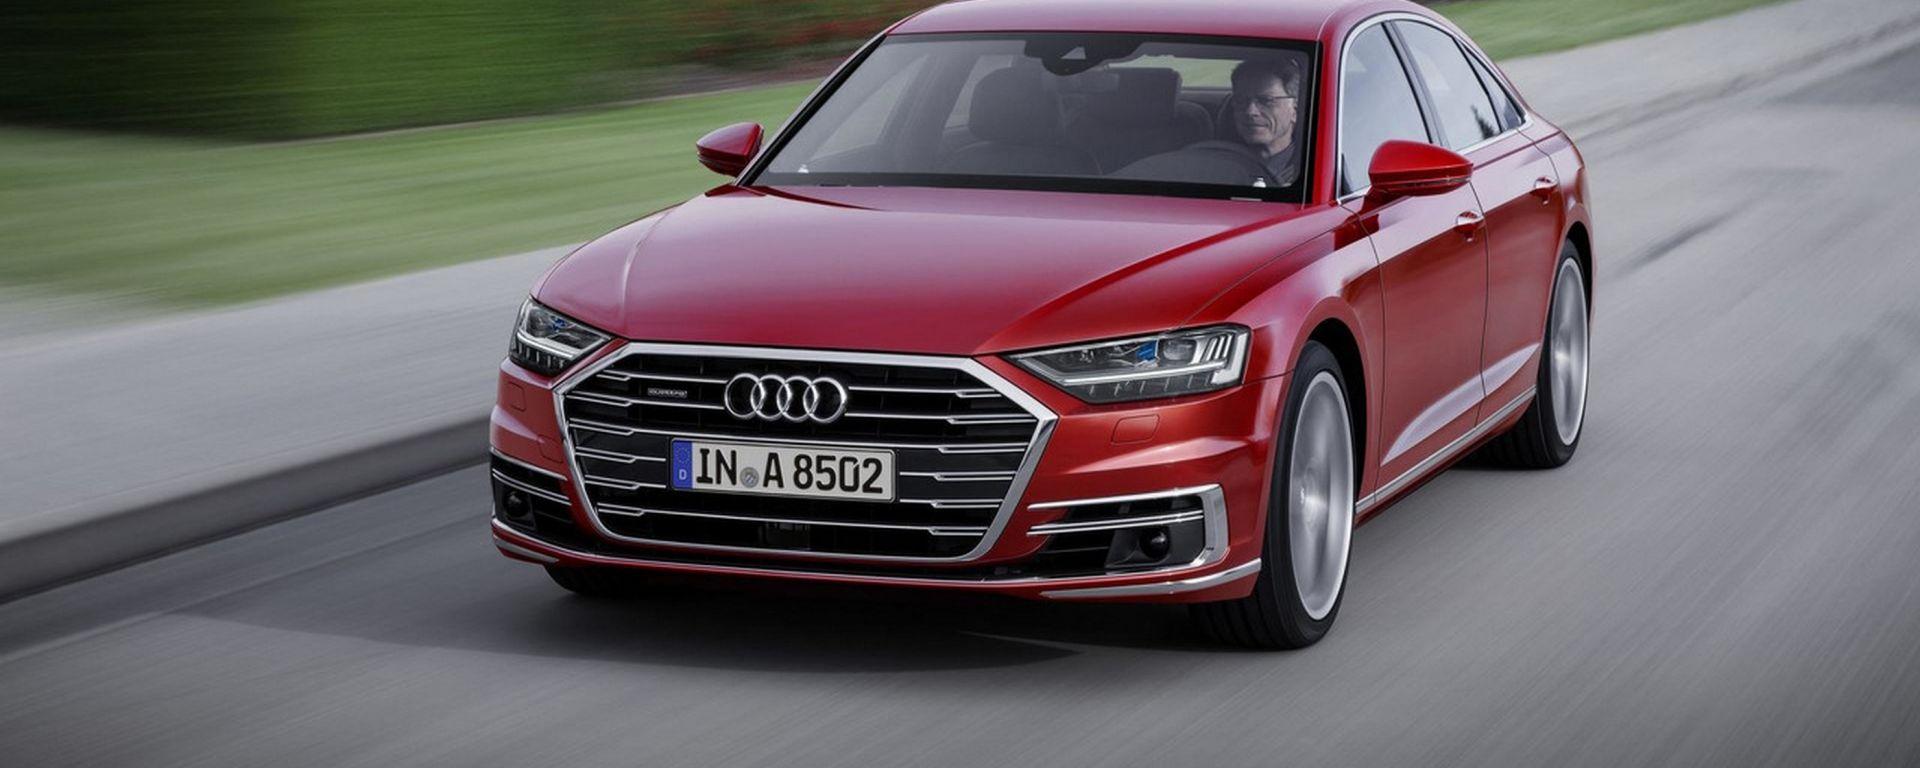 Audi A8: lusso e coccole in chiave hi-tech